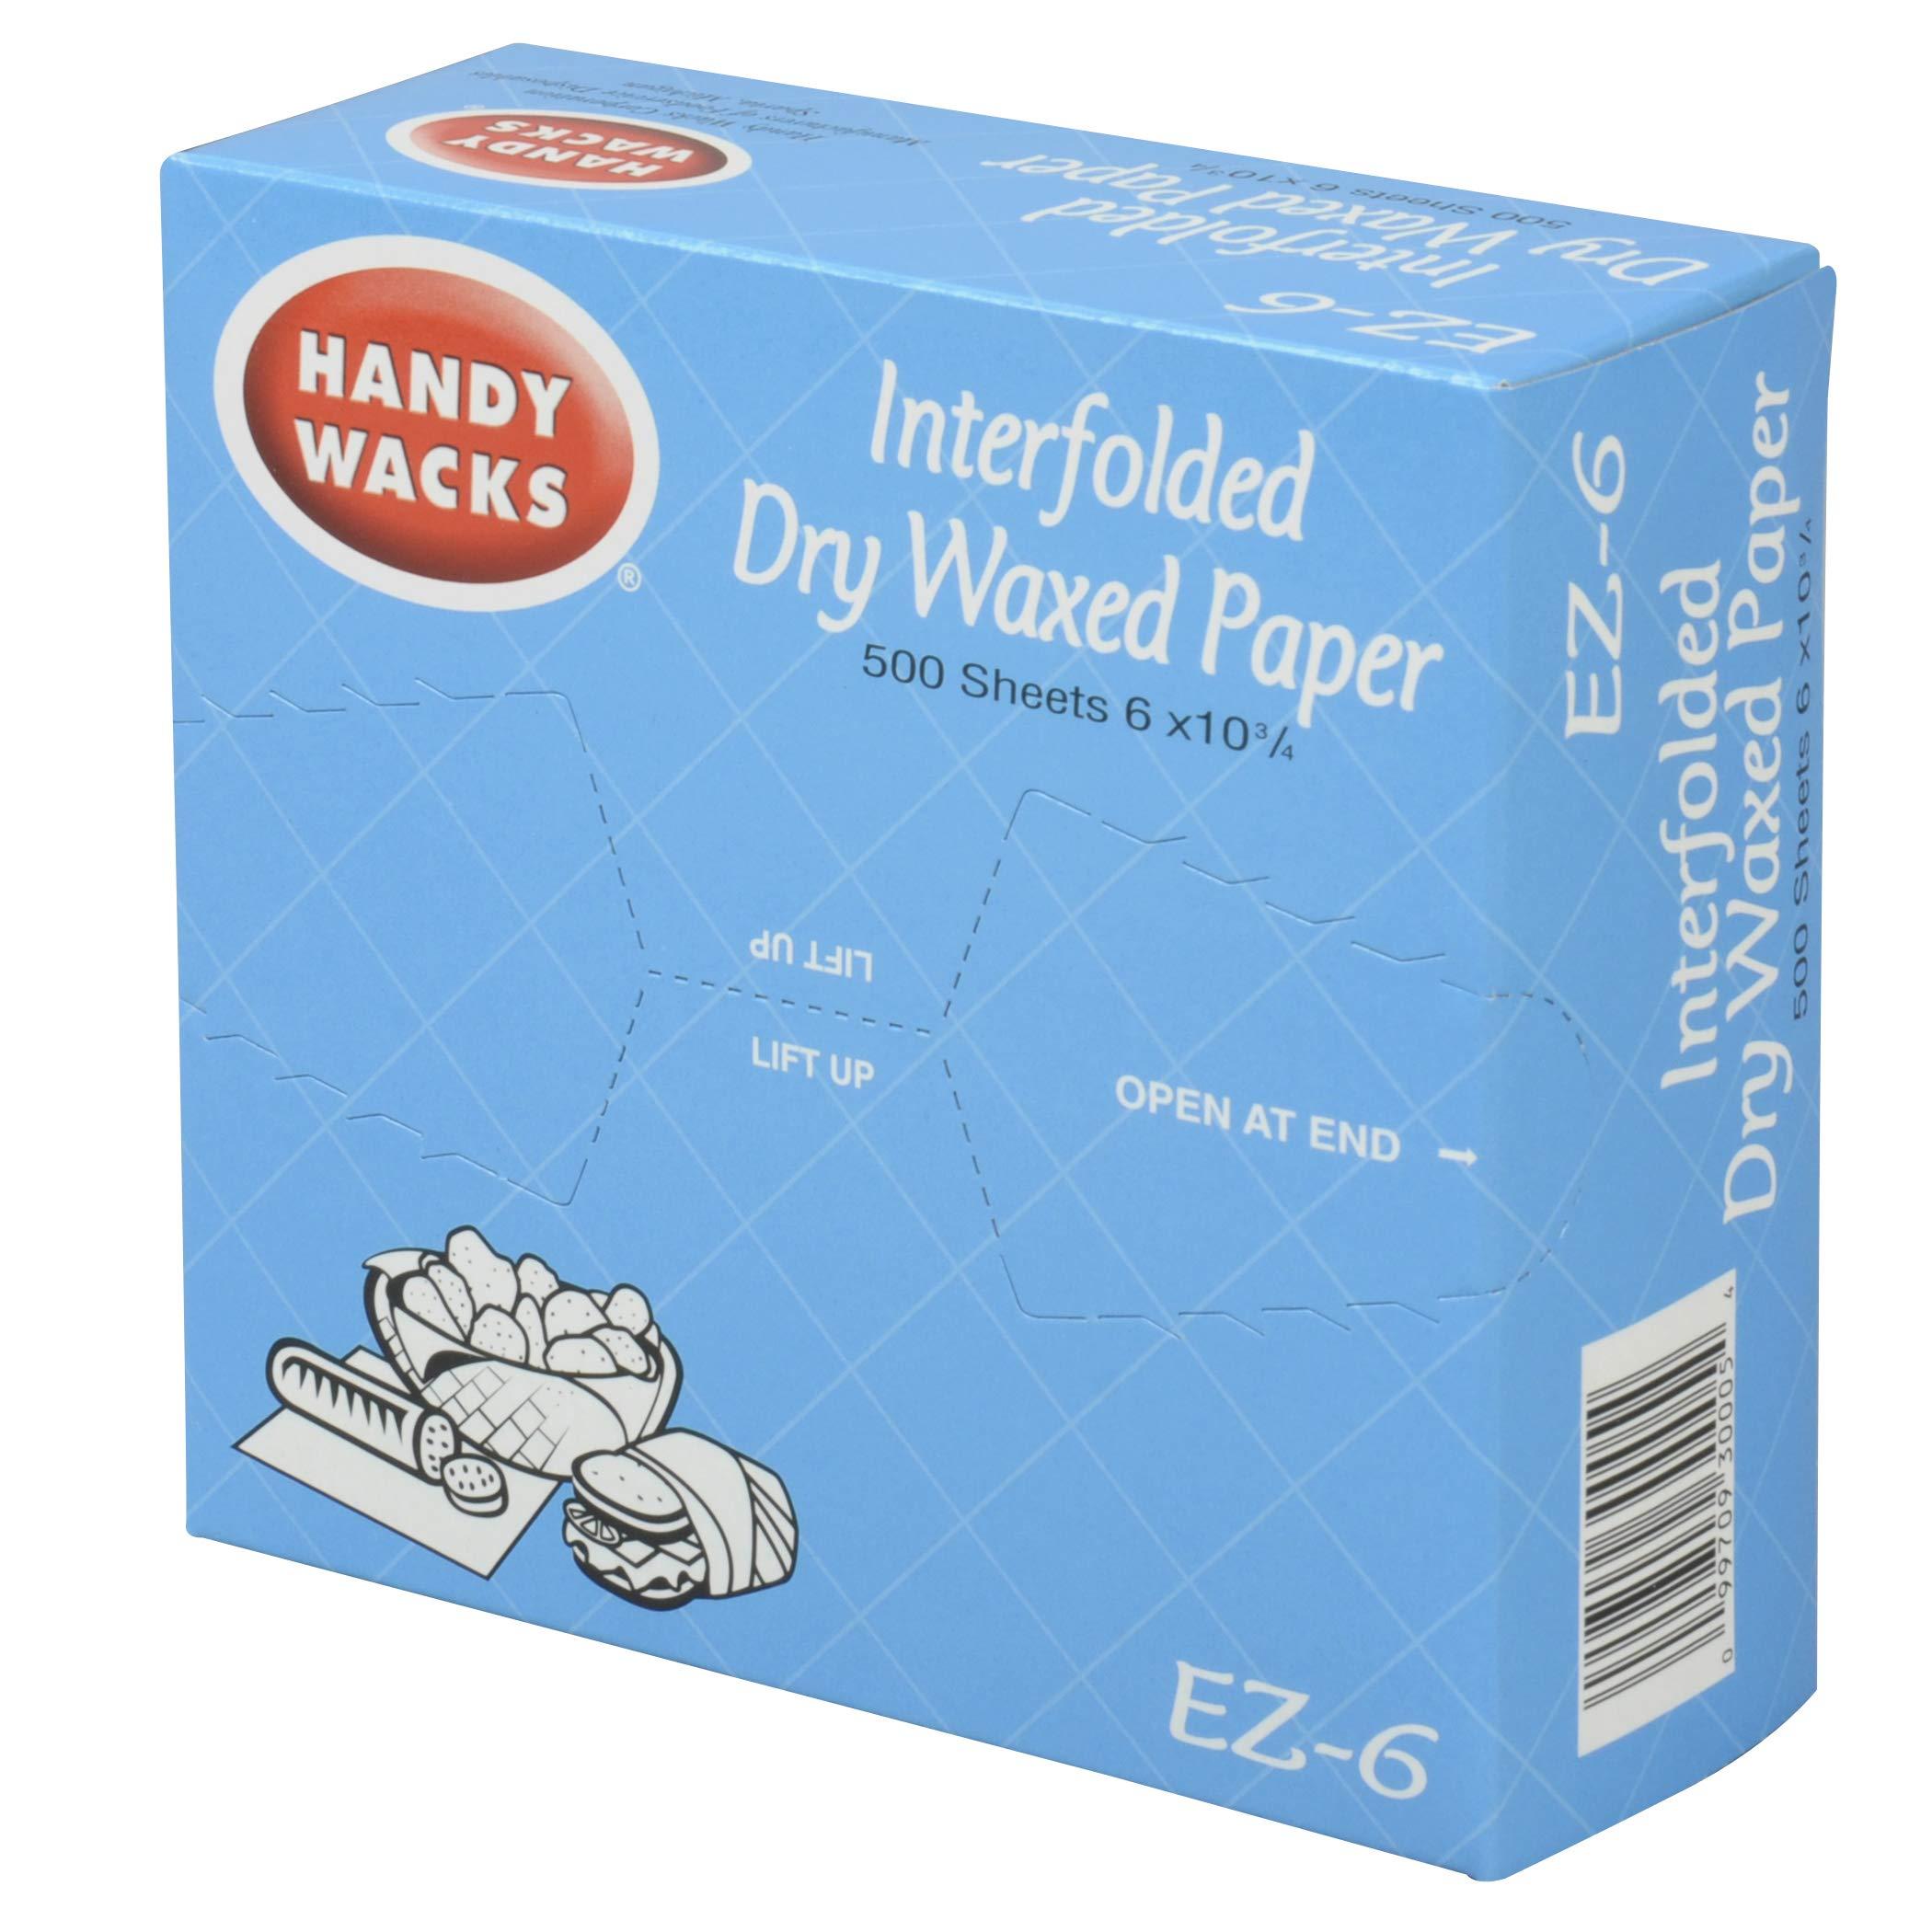 Handy Wacks Interfolded Deli Paper, 500 sheets per pack - 12 per case. by Handy Wacks (Image #1)